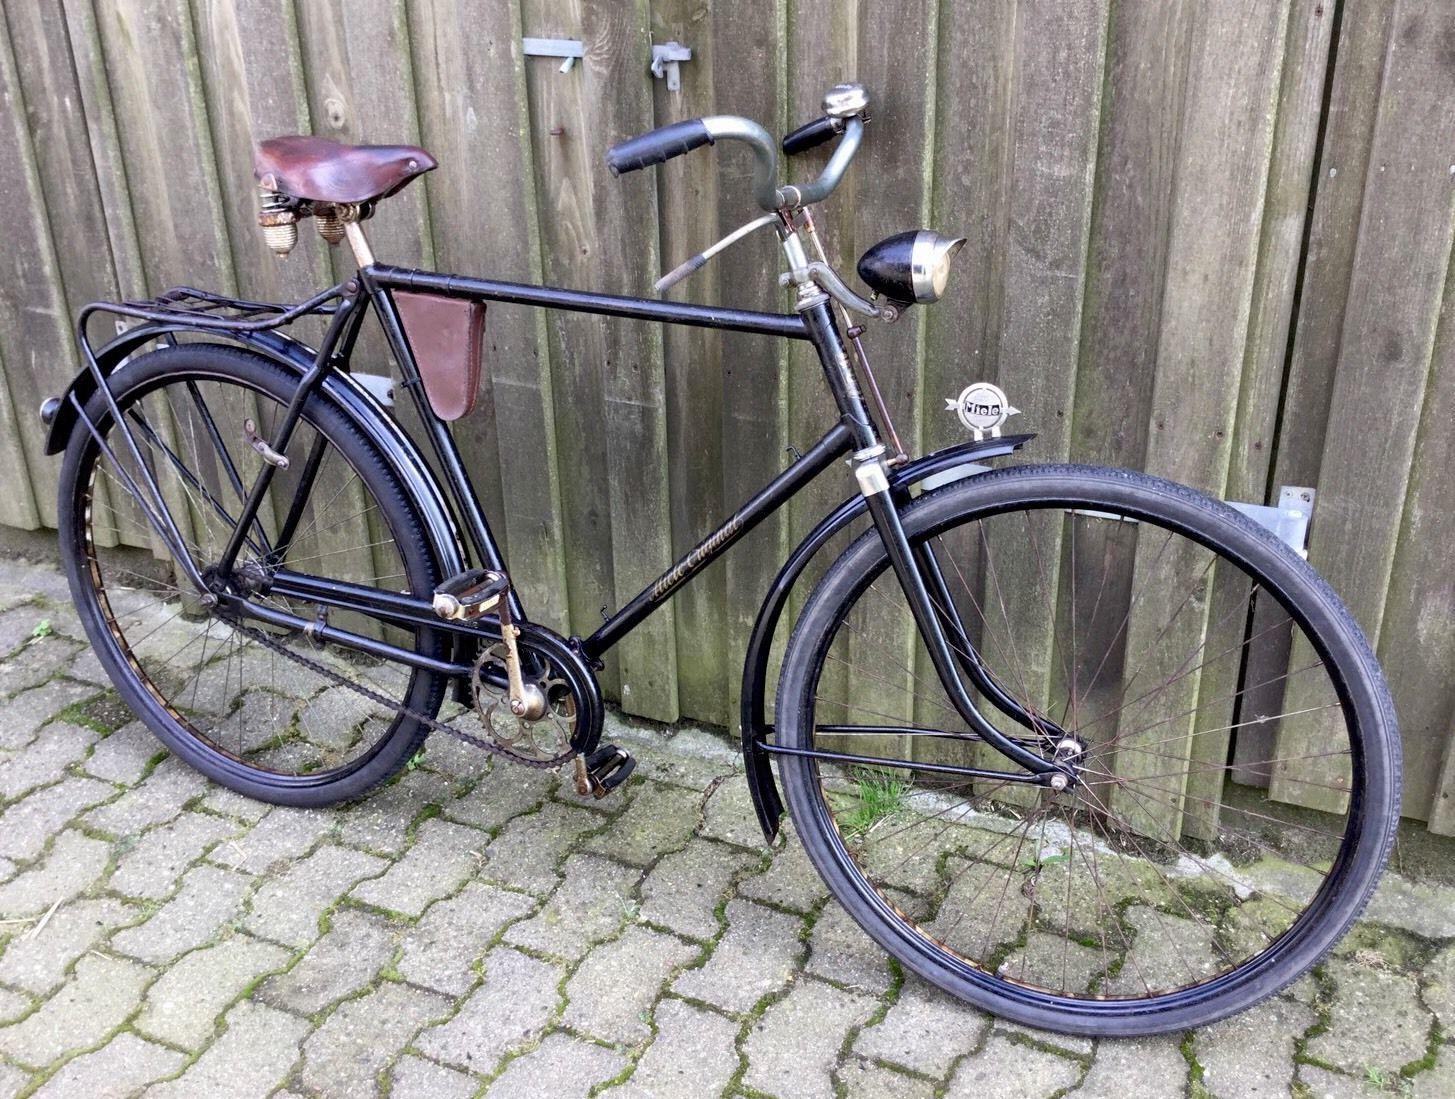 Miele Oldtimer Fahrrad Herrenfahrrad Von 1950 Herrenfahrrad